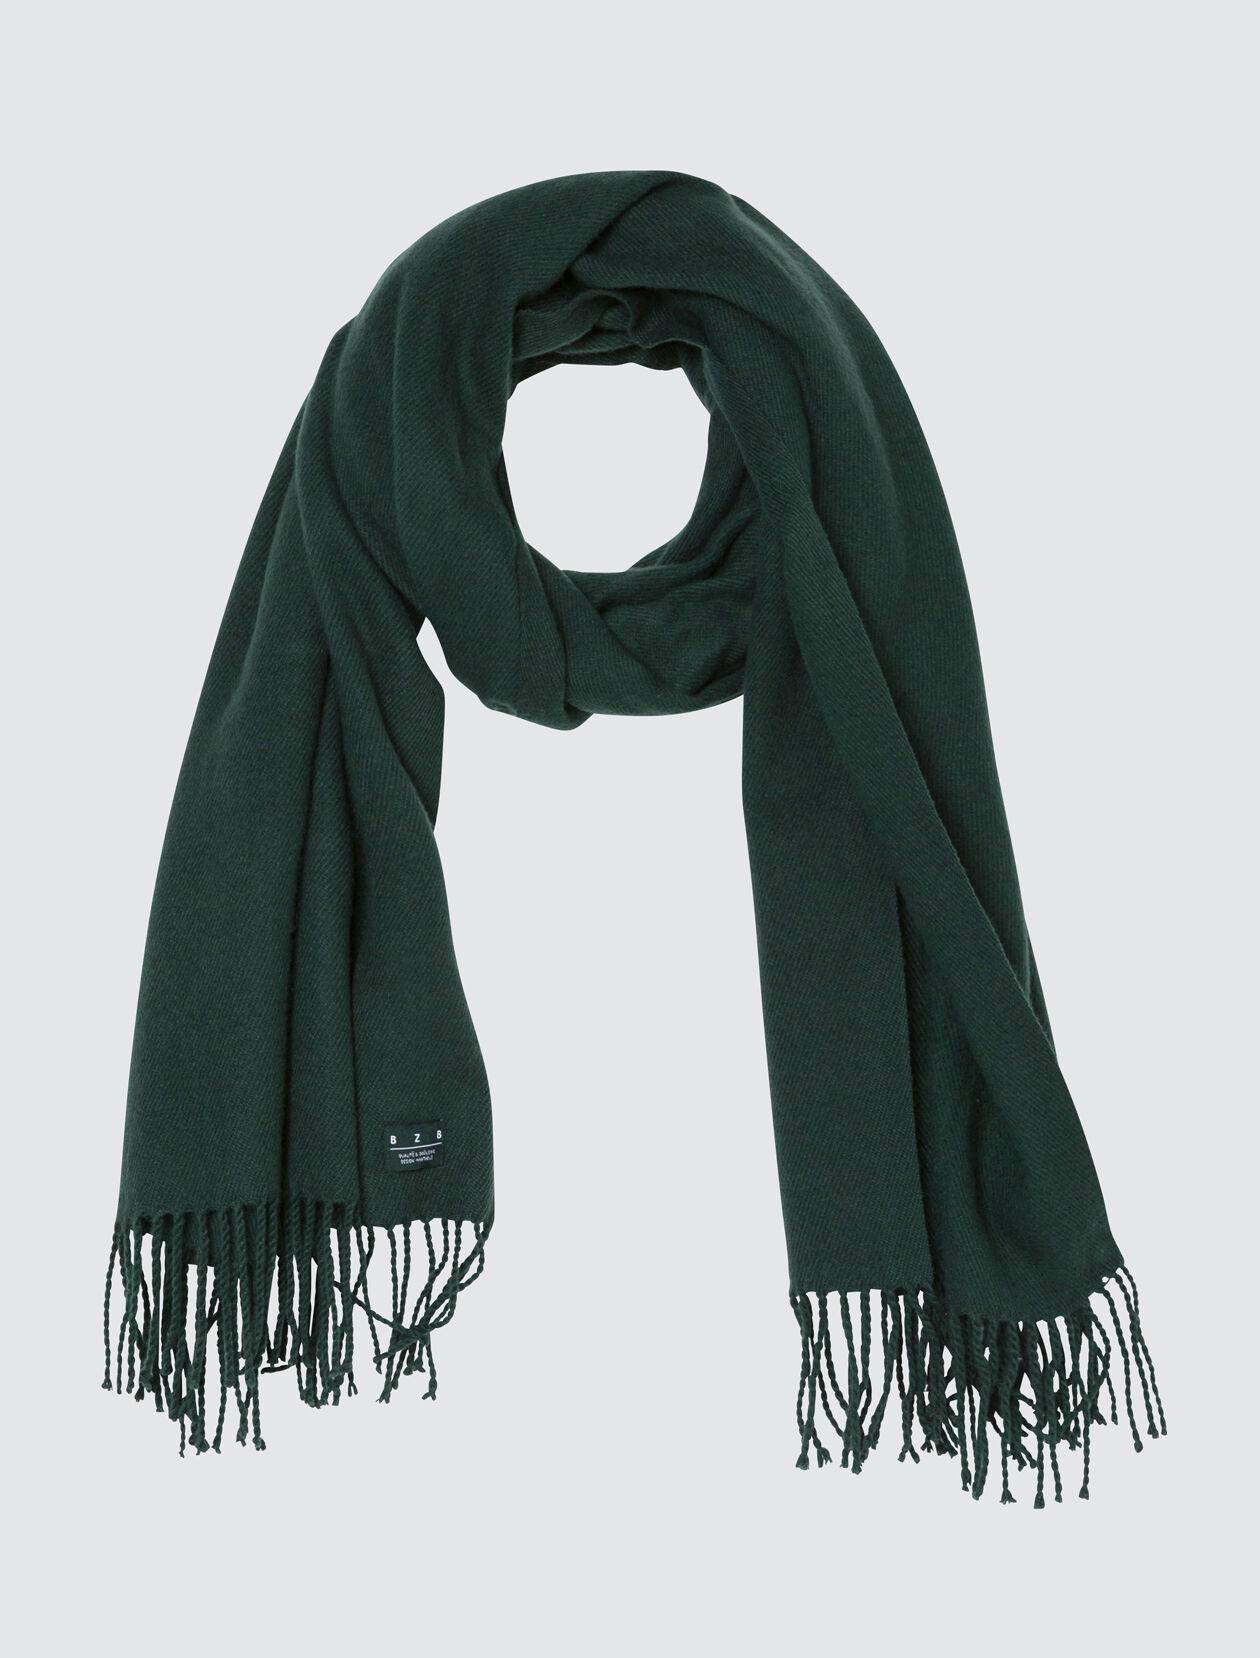 Foulard Chaud Gratté à Franges Femme Vert Bouteille